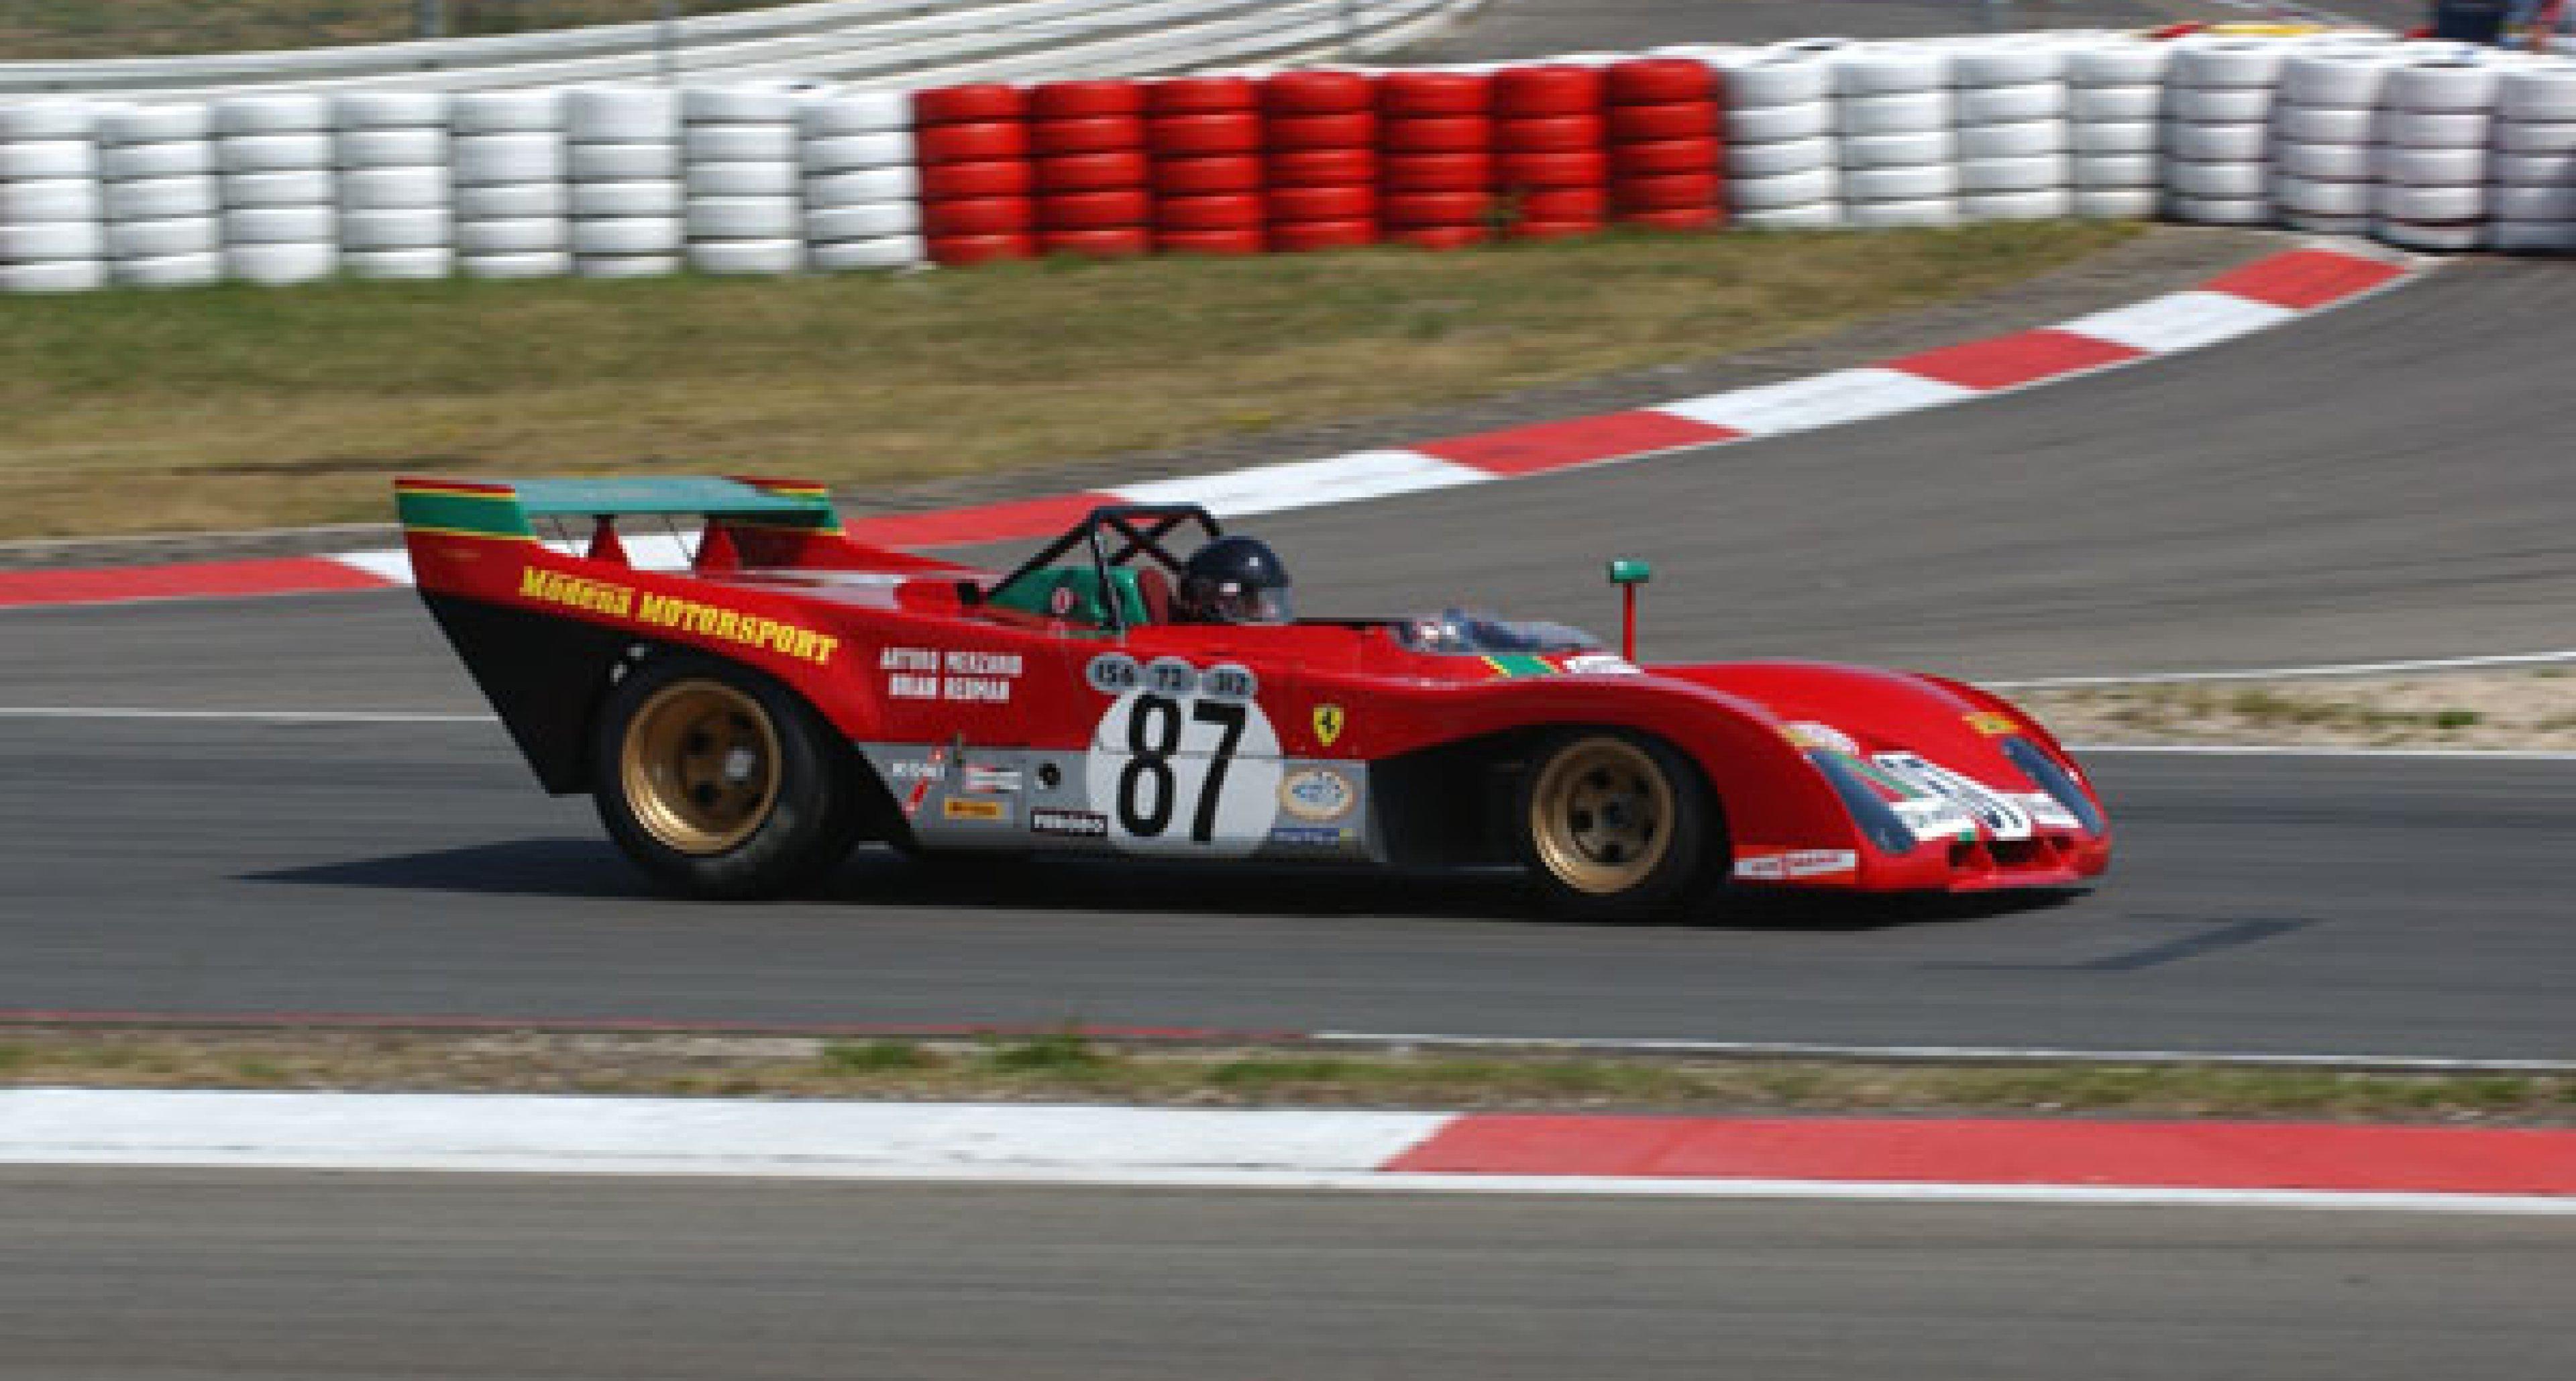 10. Modena Motorsport Track Days 2003